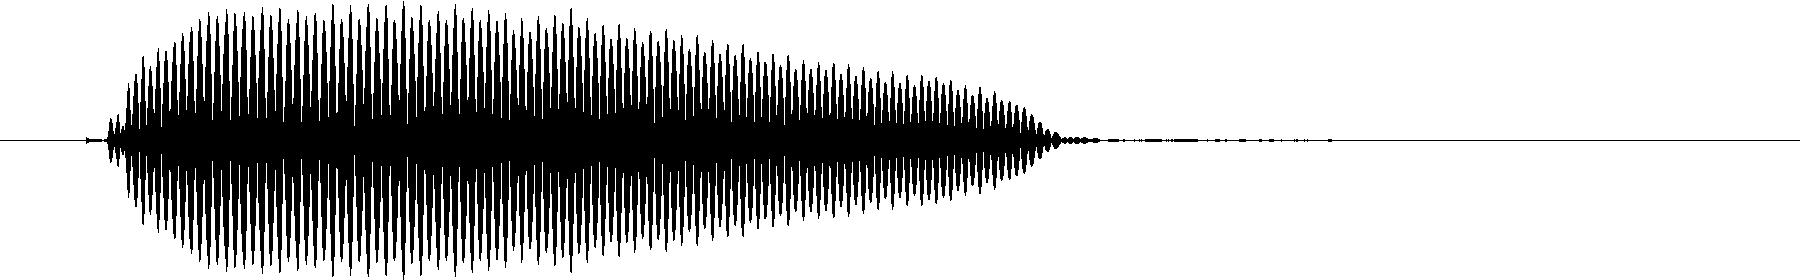 alvinspk74